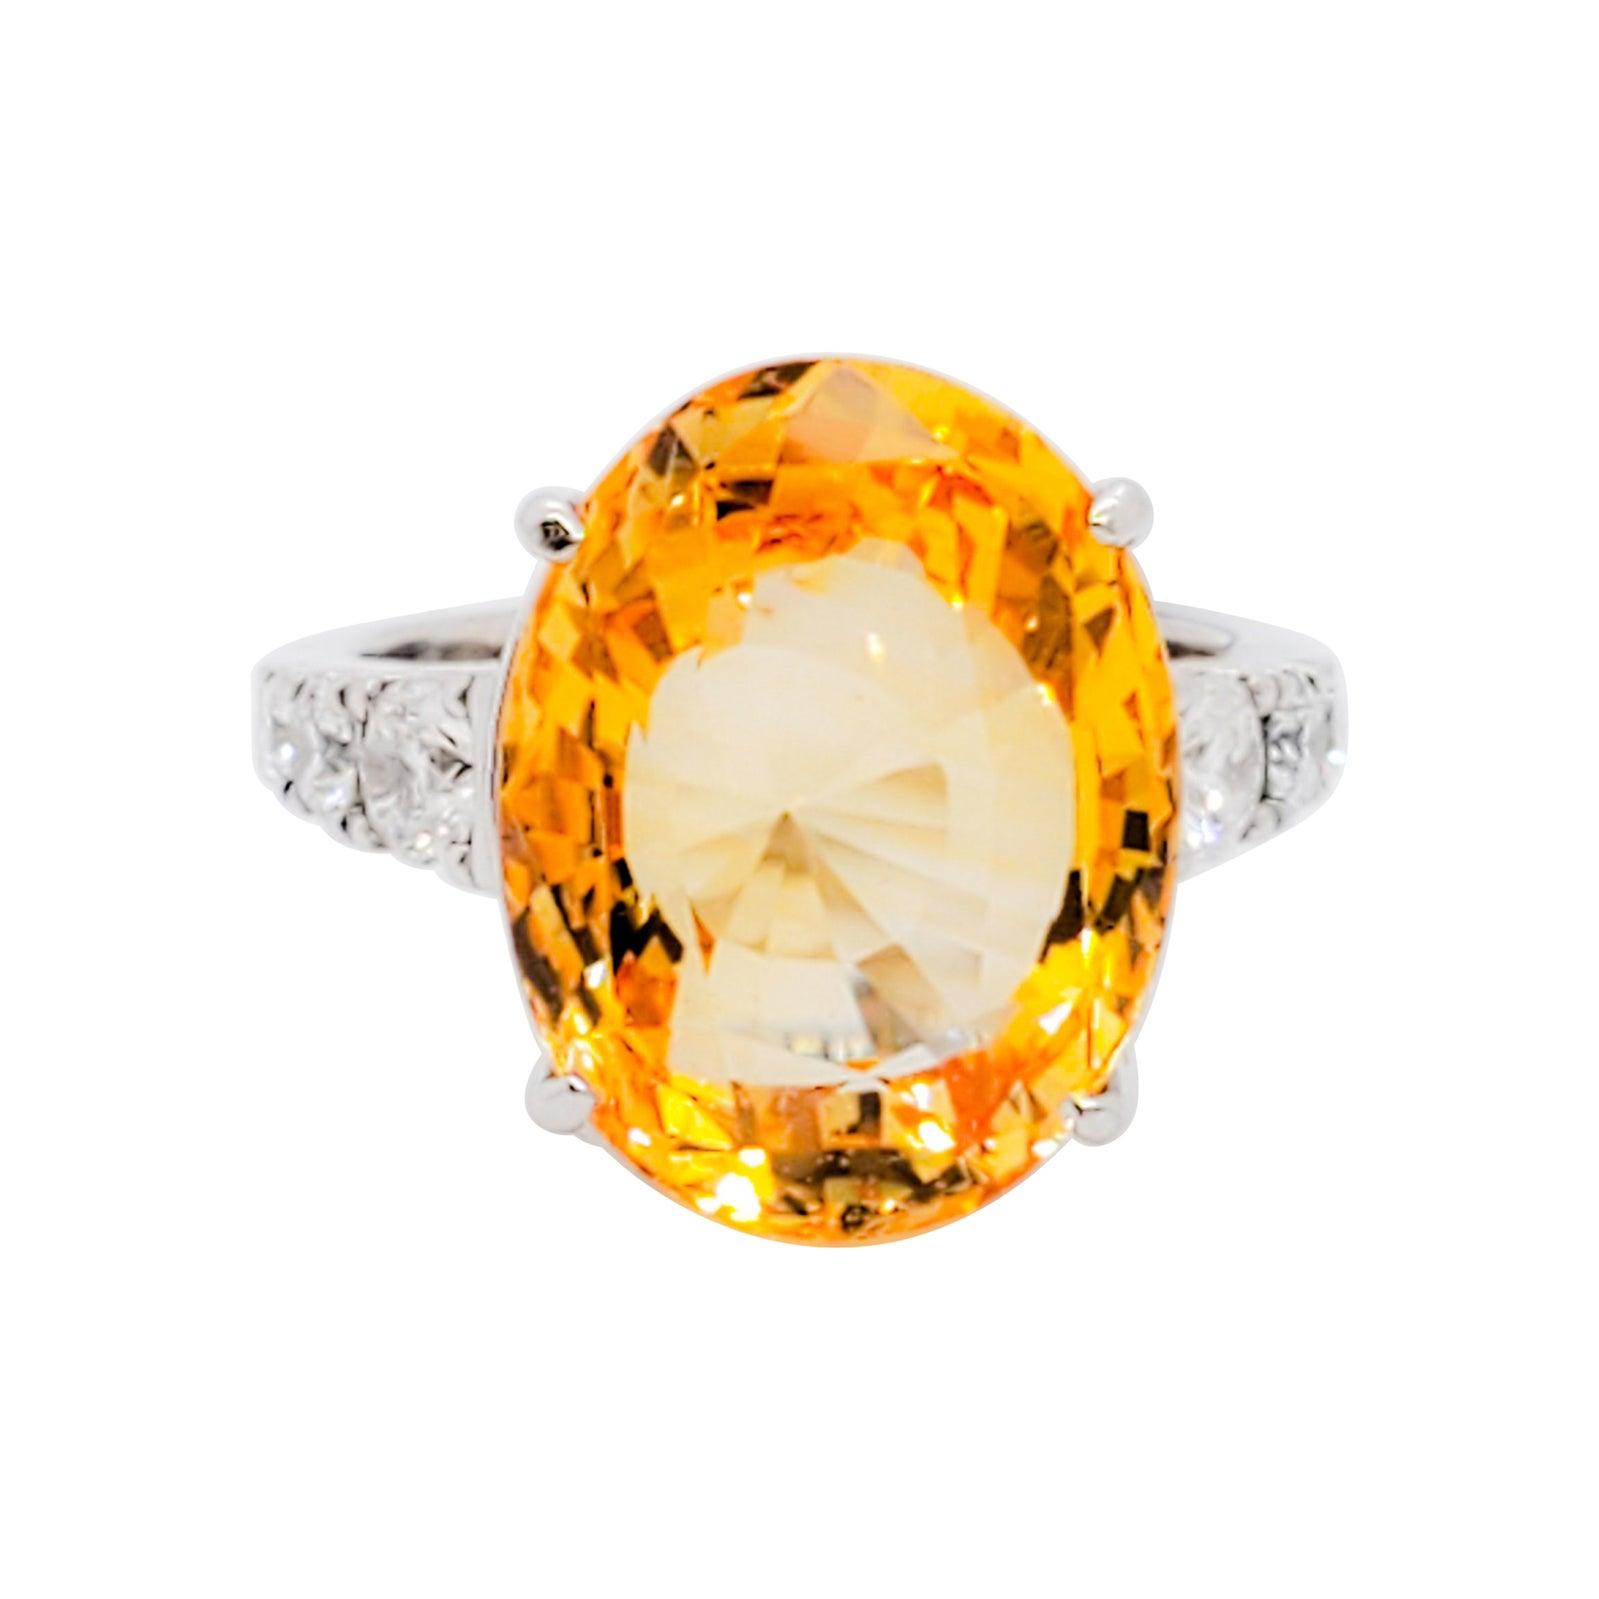 No Heat Sri Lanka Yellow Sapphire Oval and White Diamond Cocktail Ring